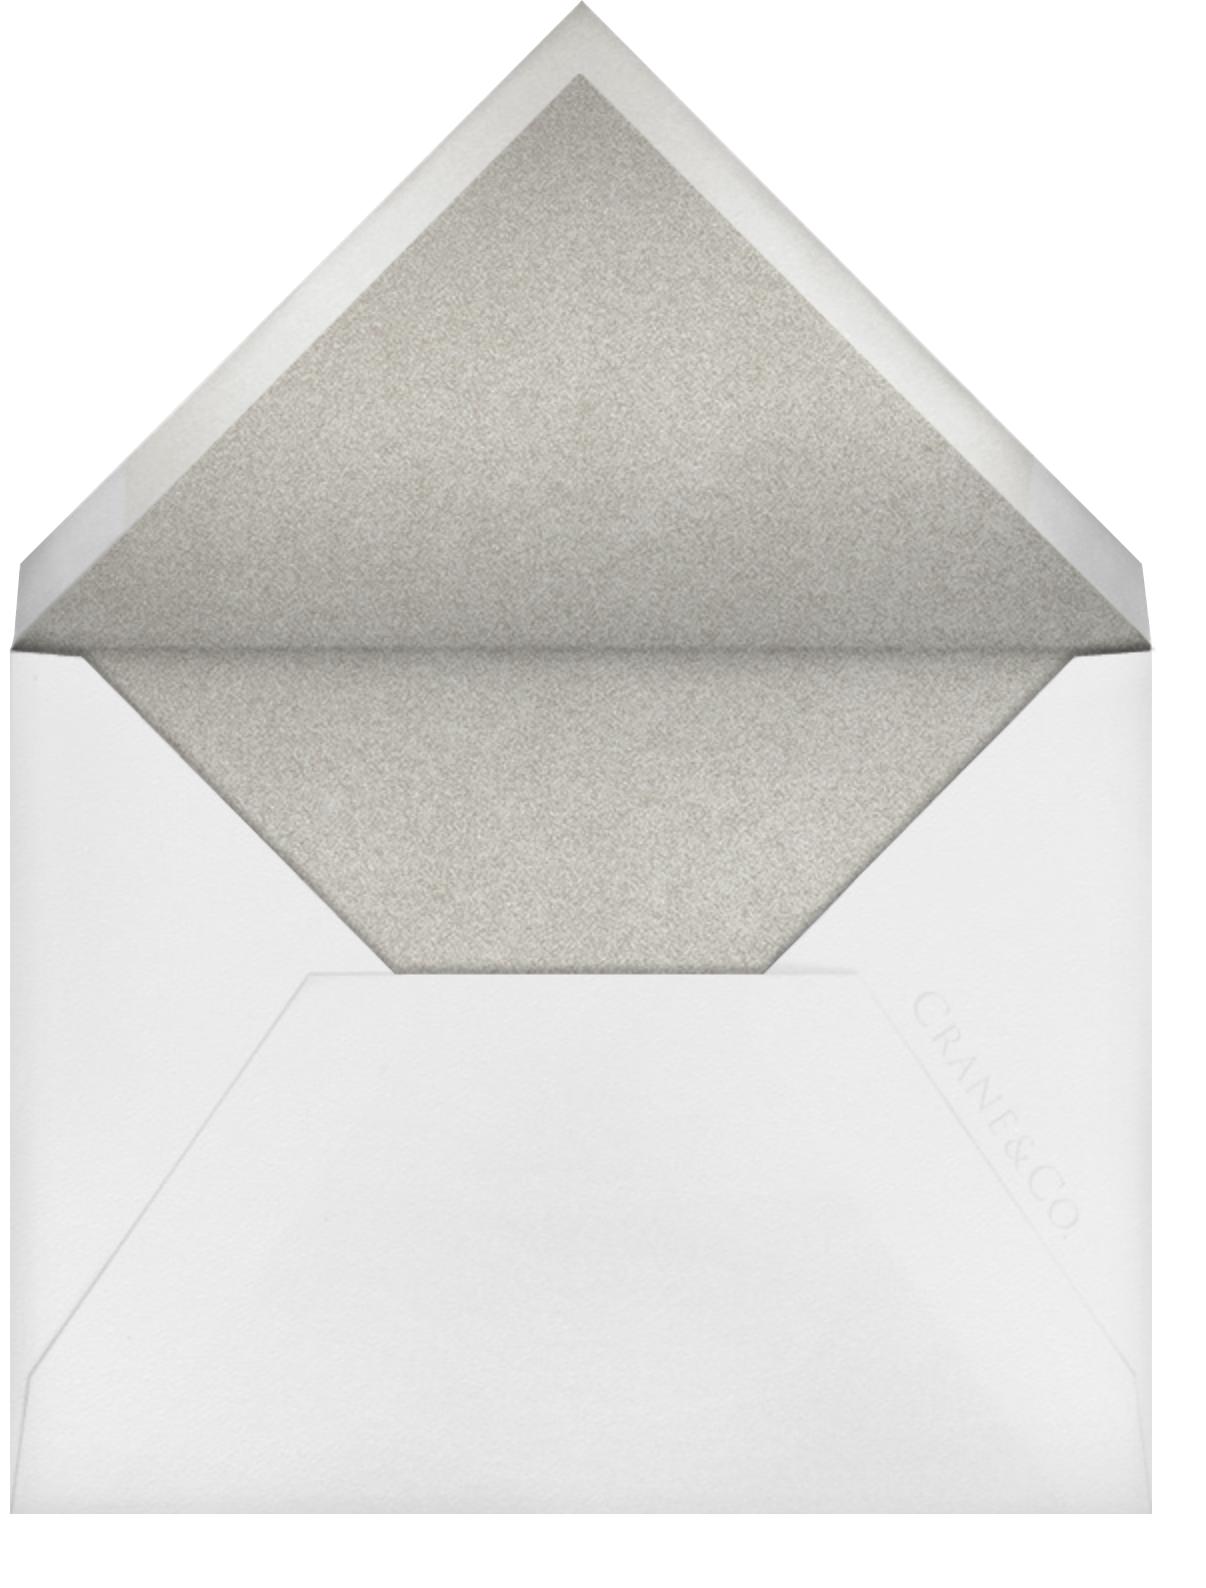 Collins Avenue - Platinum & Black - Crane & Co. - All - envelope back